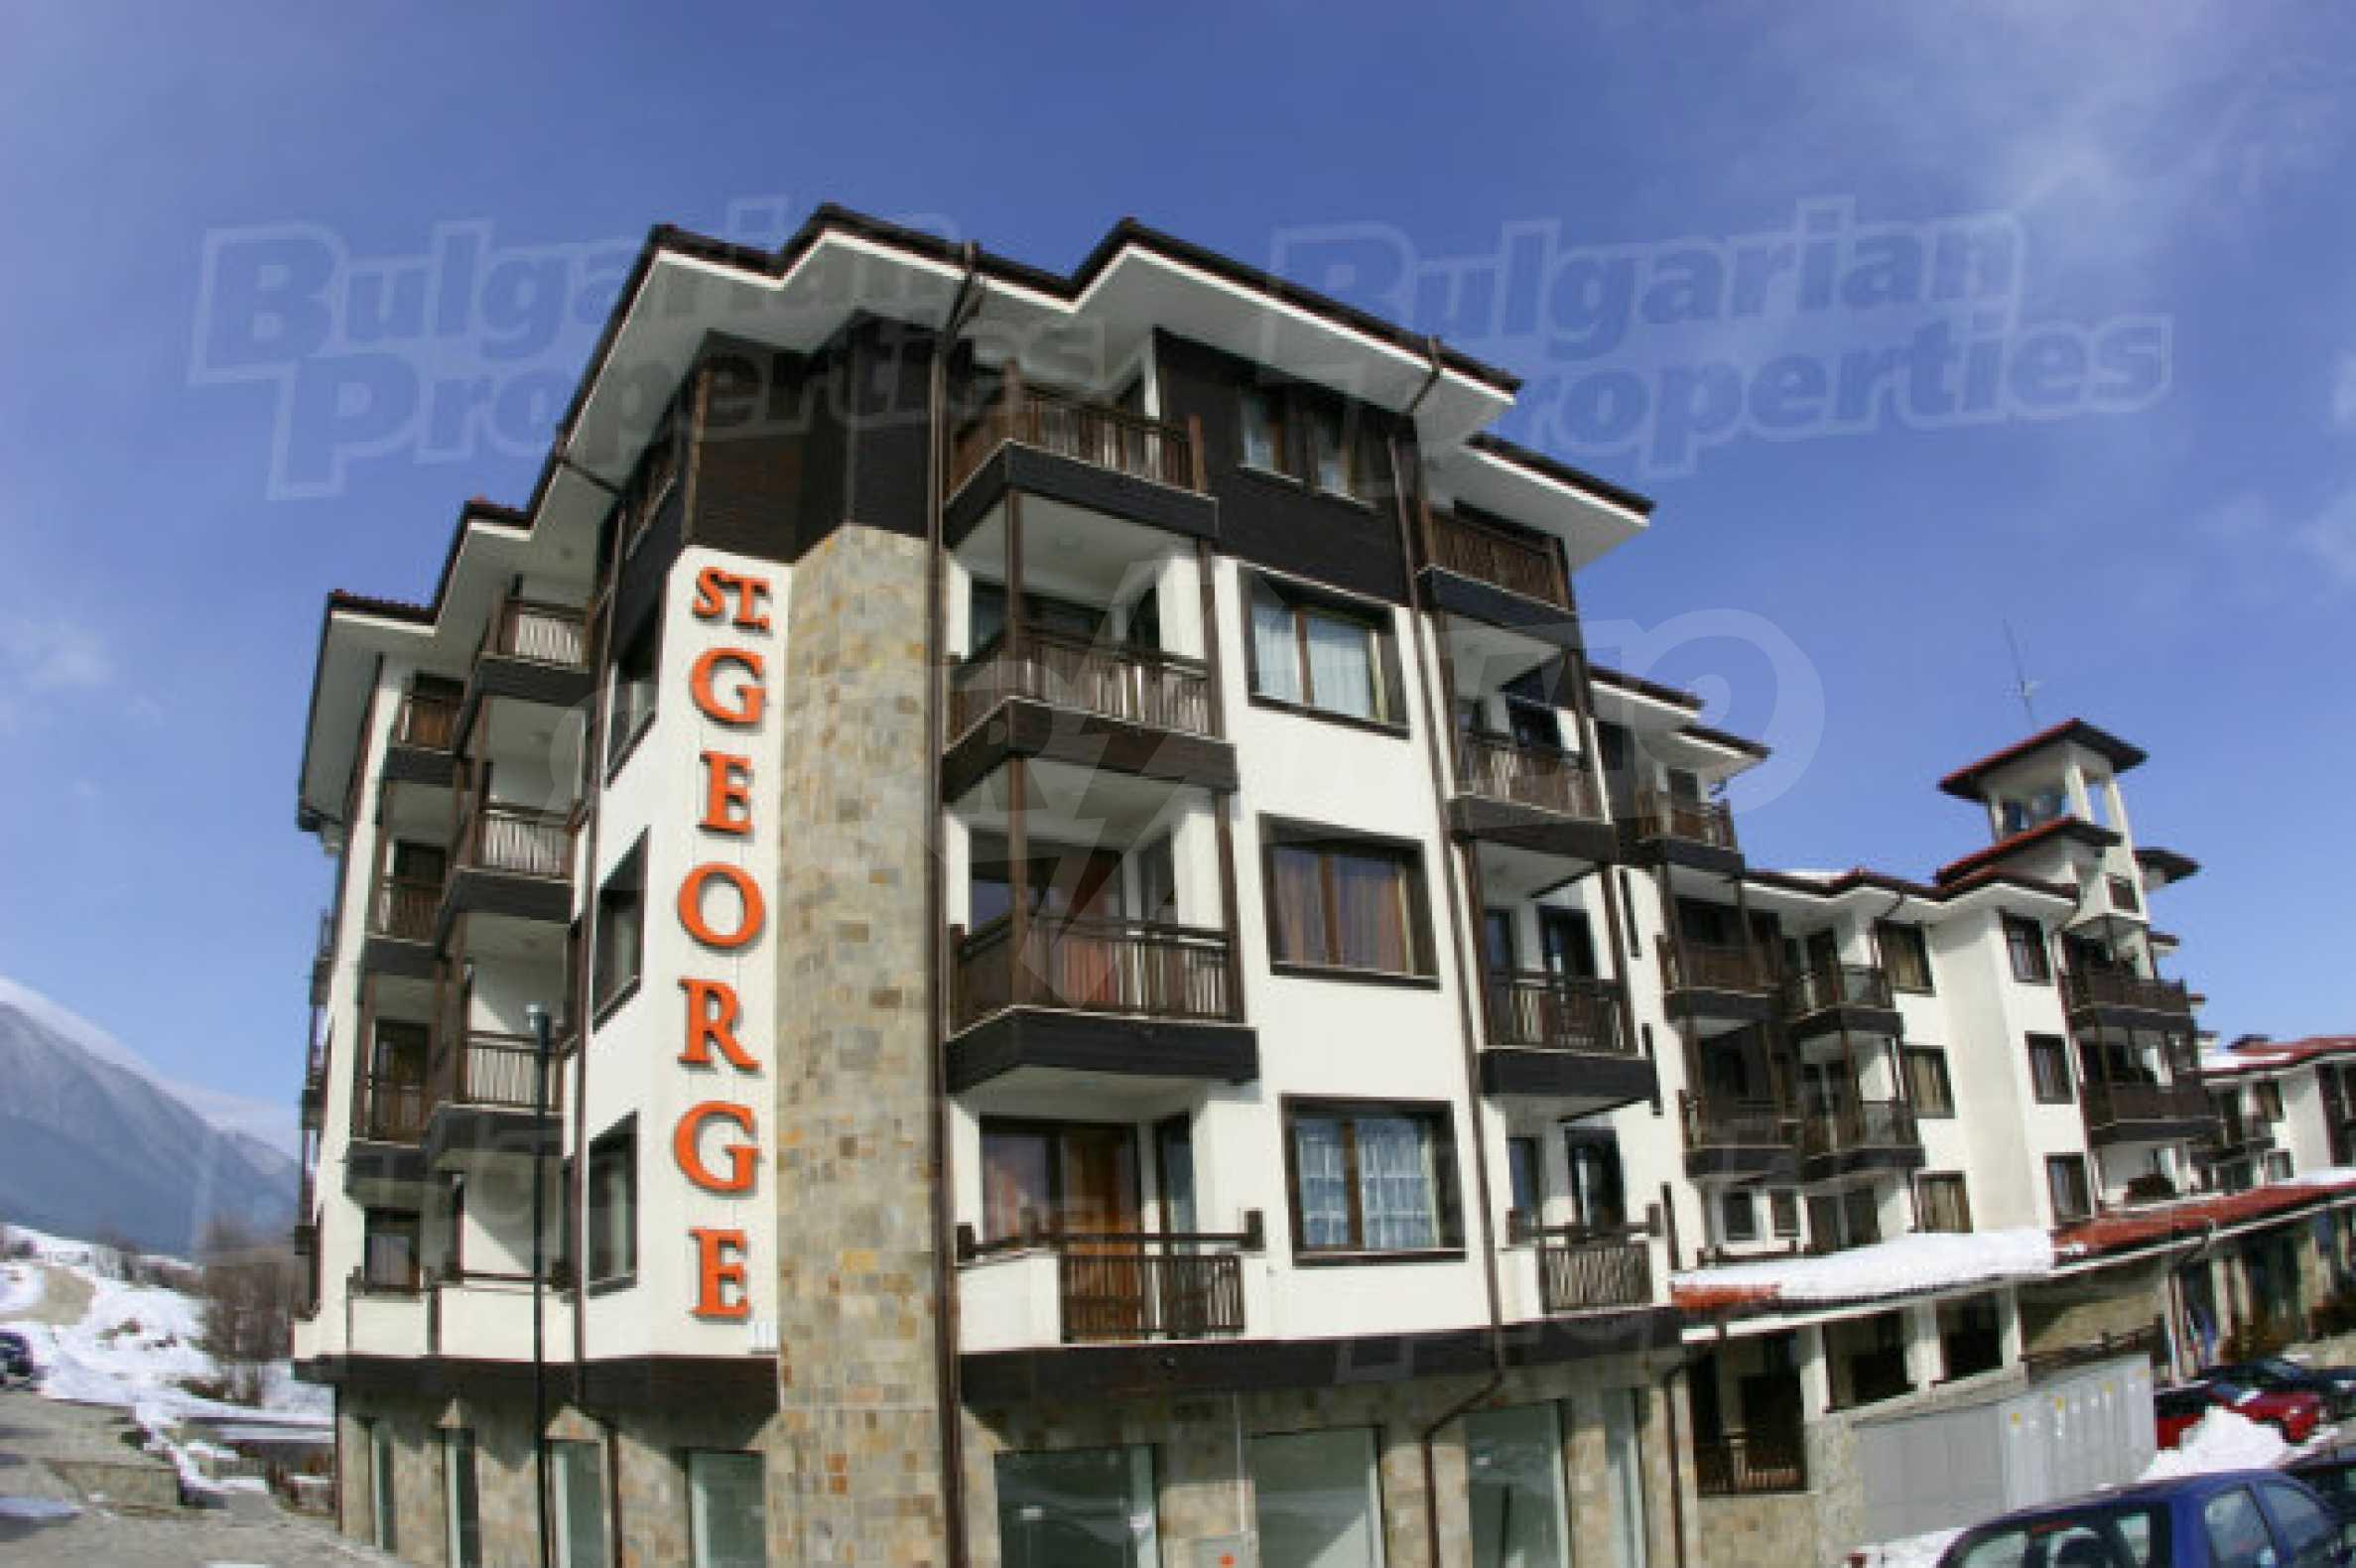 St. George Ski & Spa